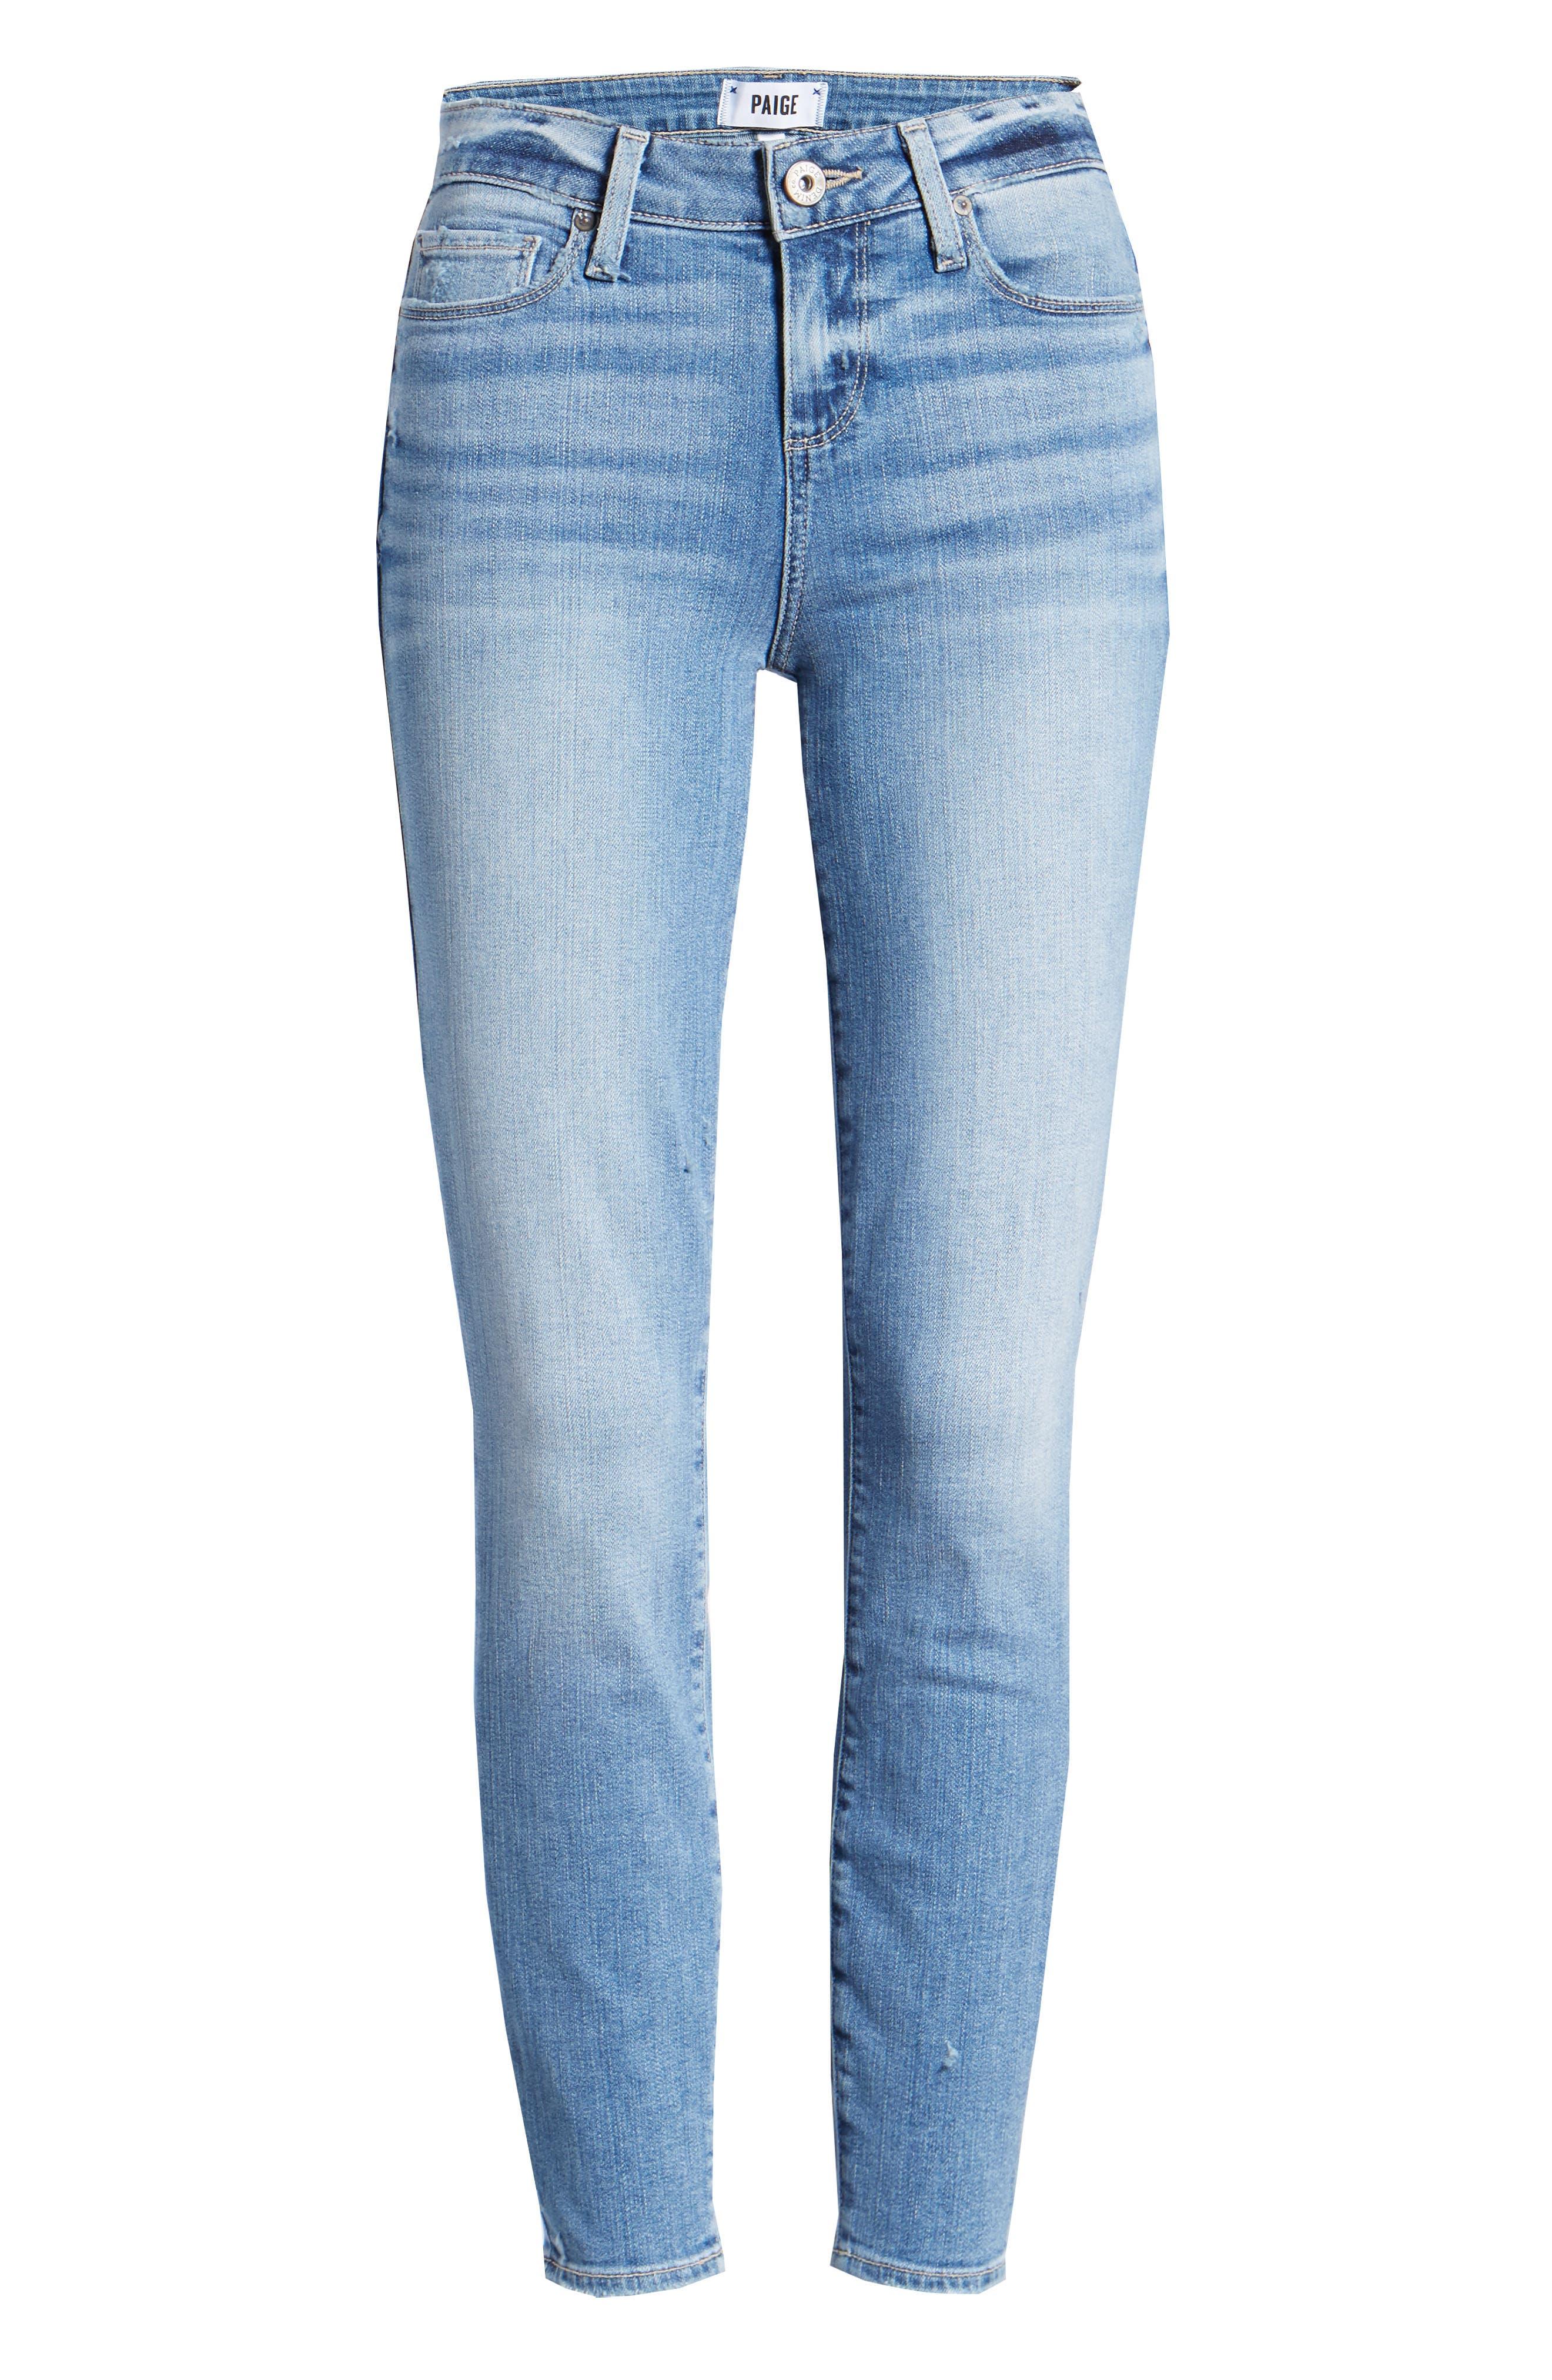 Verdugo Crop Skinny Jeans,                             Alternate thumbnail 7, color,                             SOTO